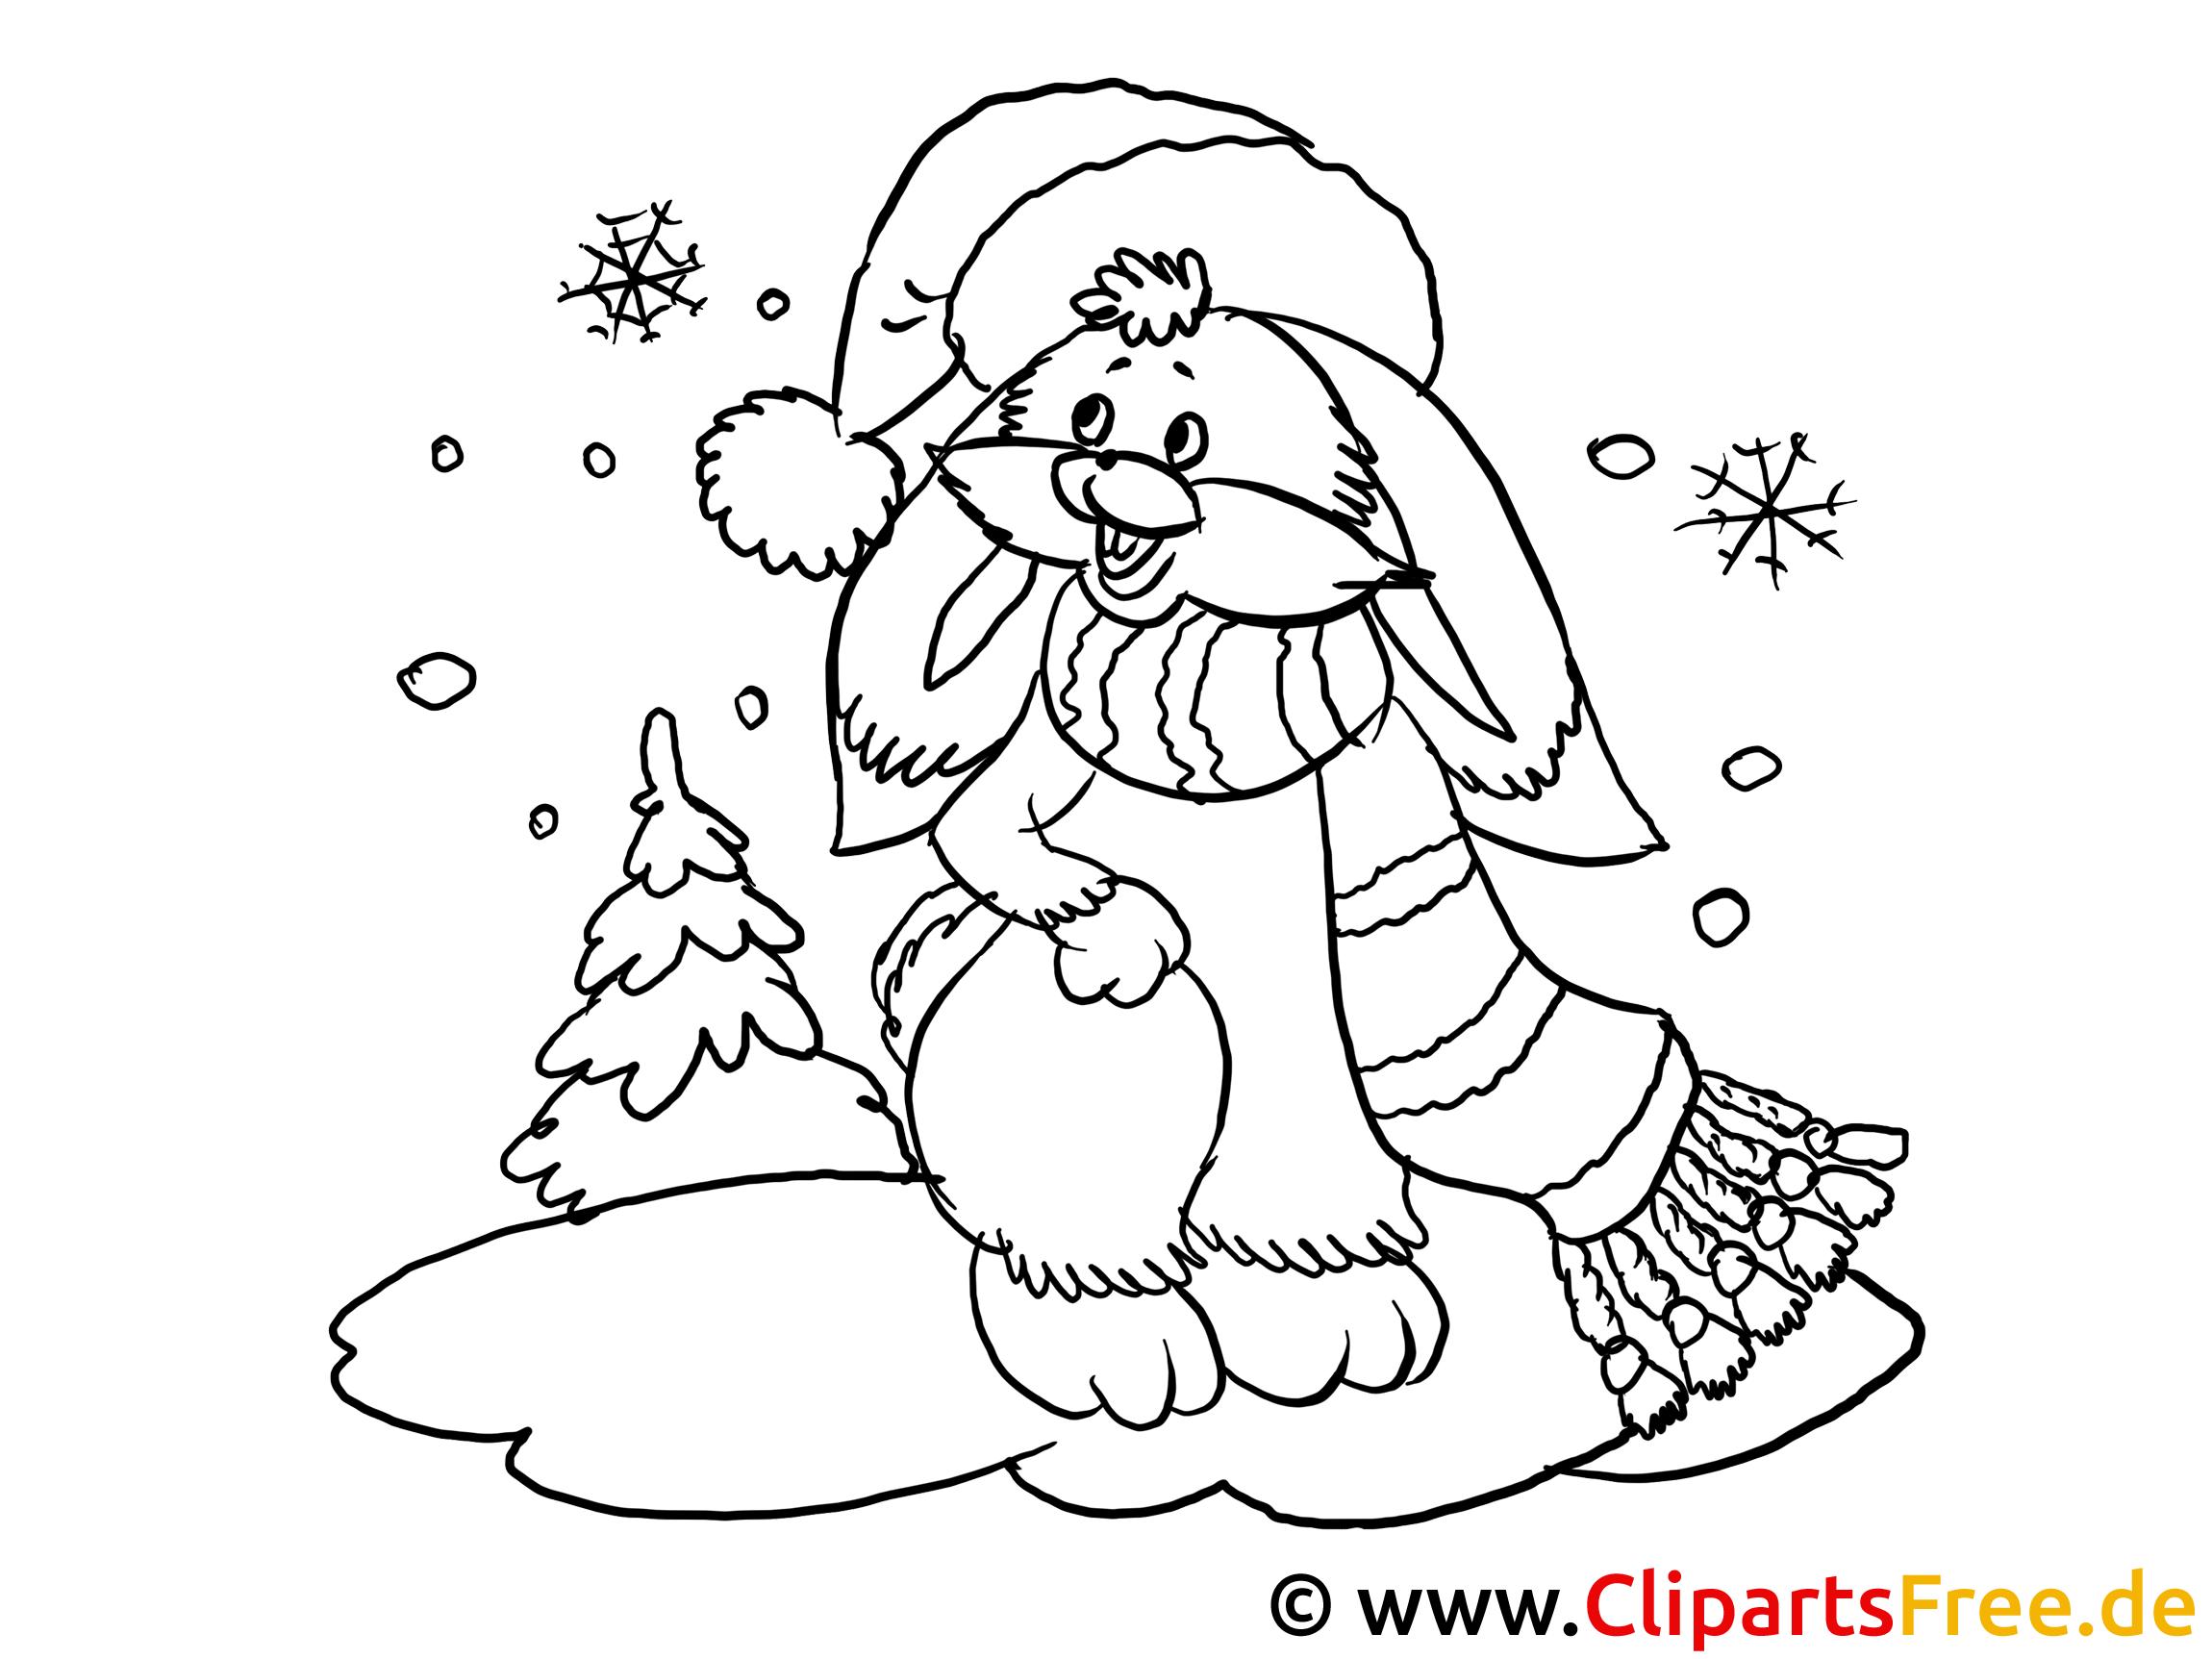 kostenloses pdfausmalbild hase im winter